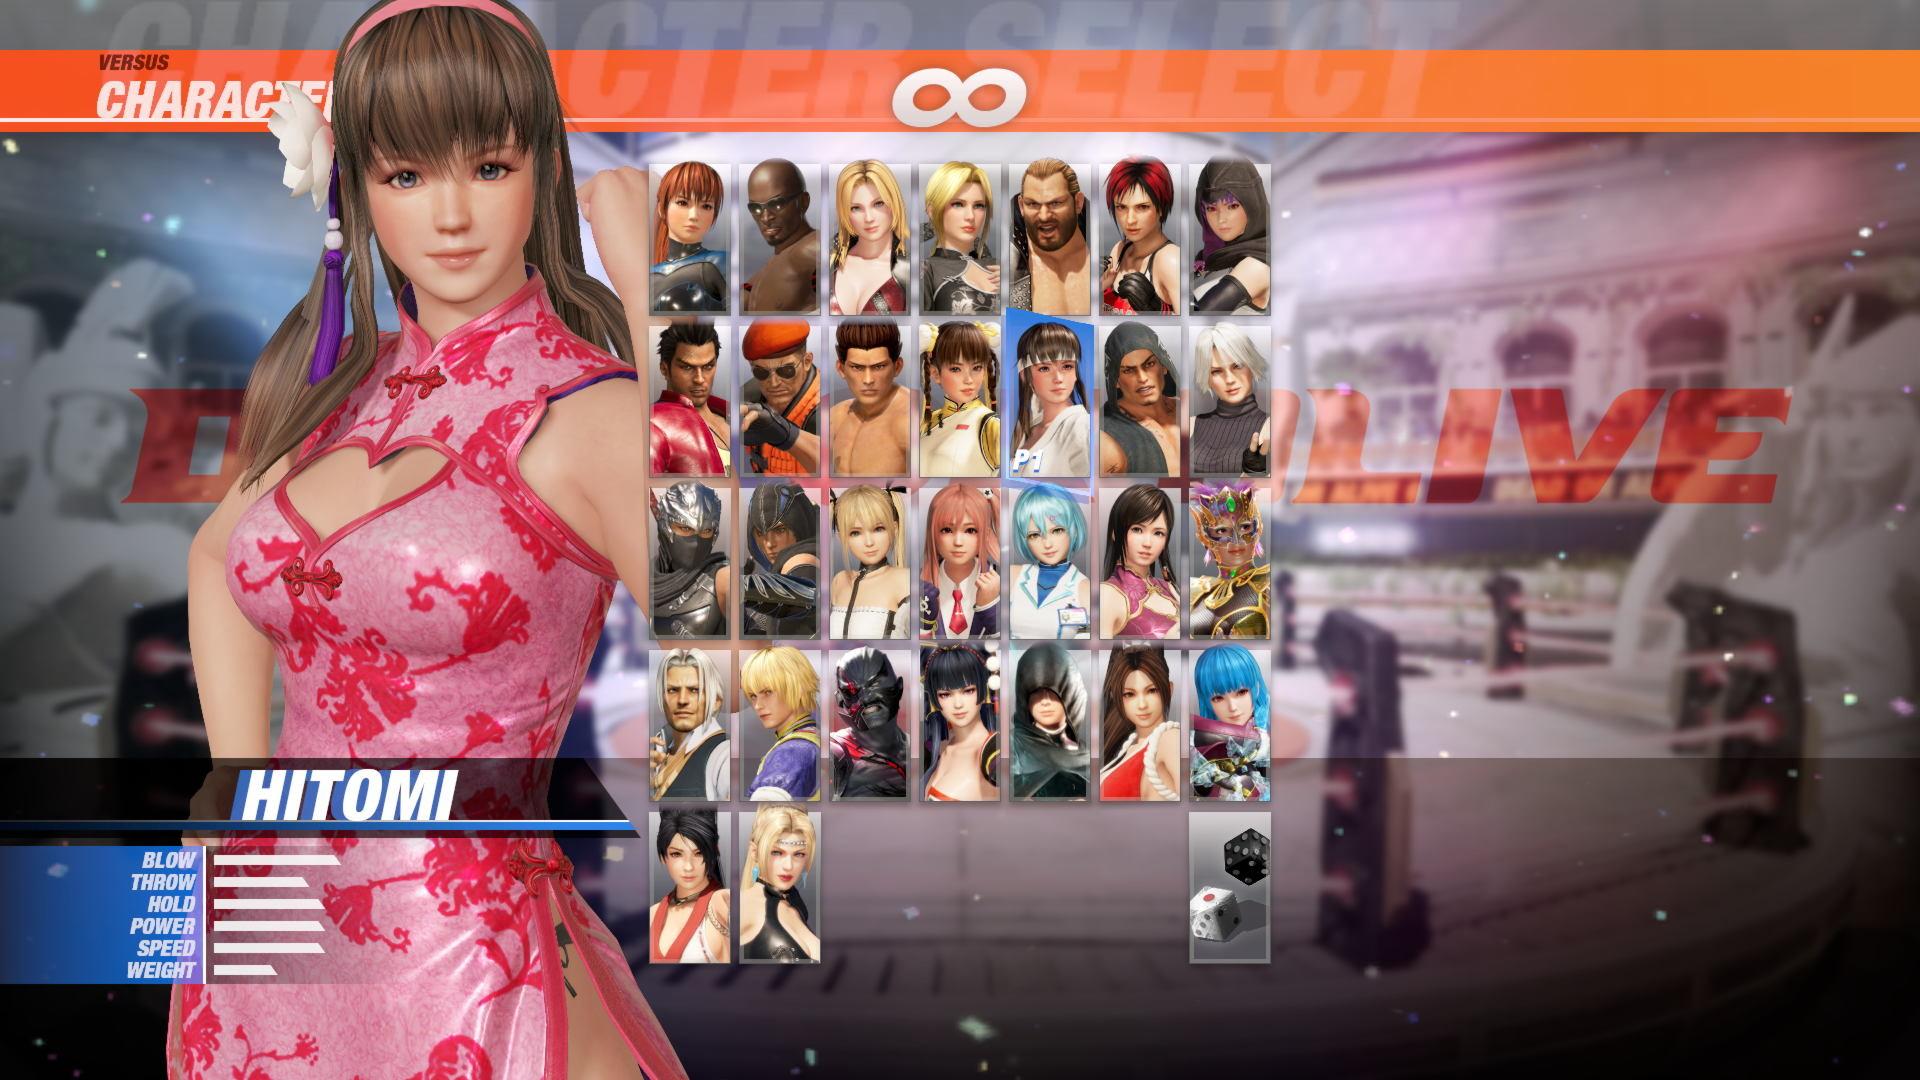 [Revival] DOA6 Alluring Mandarin Dress - Hitomi screenshot